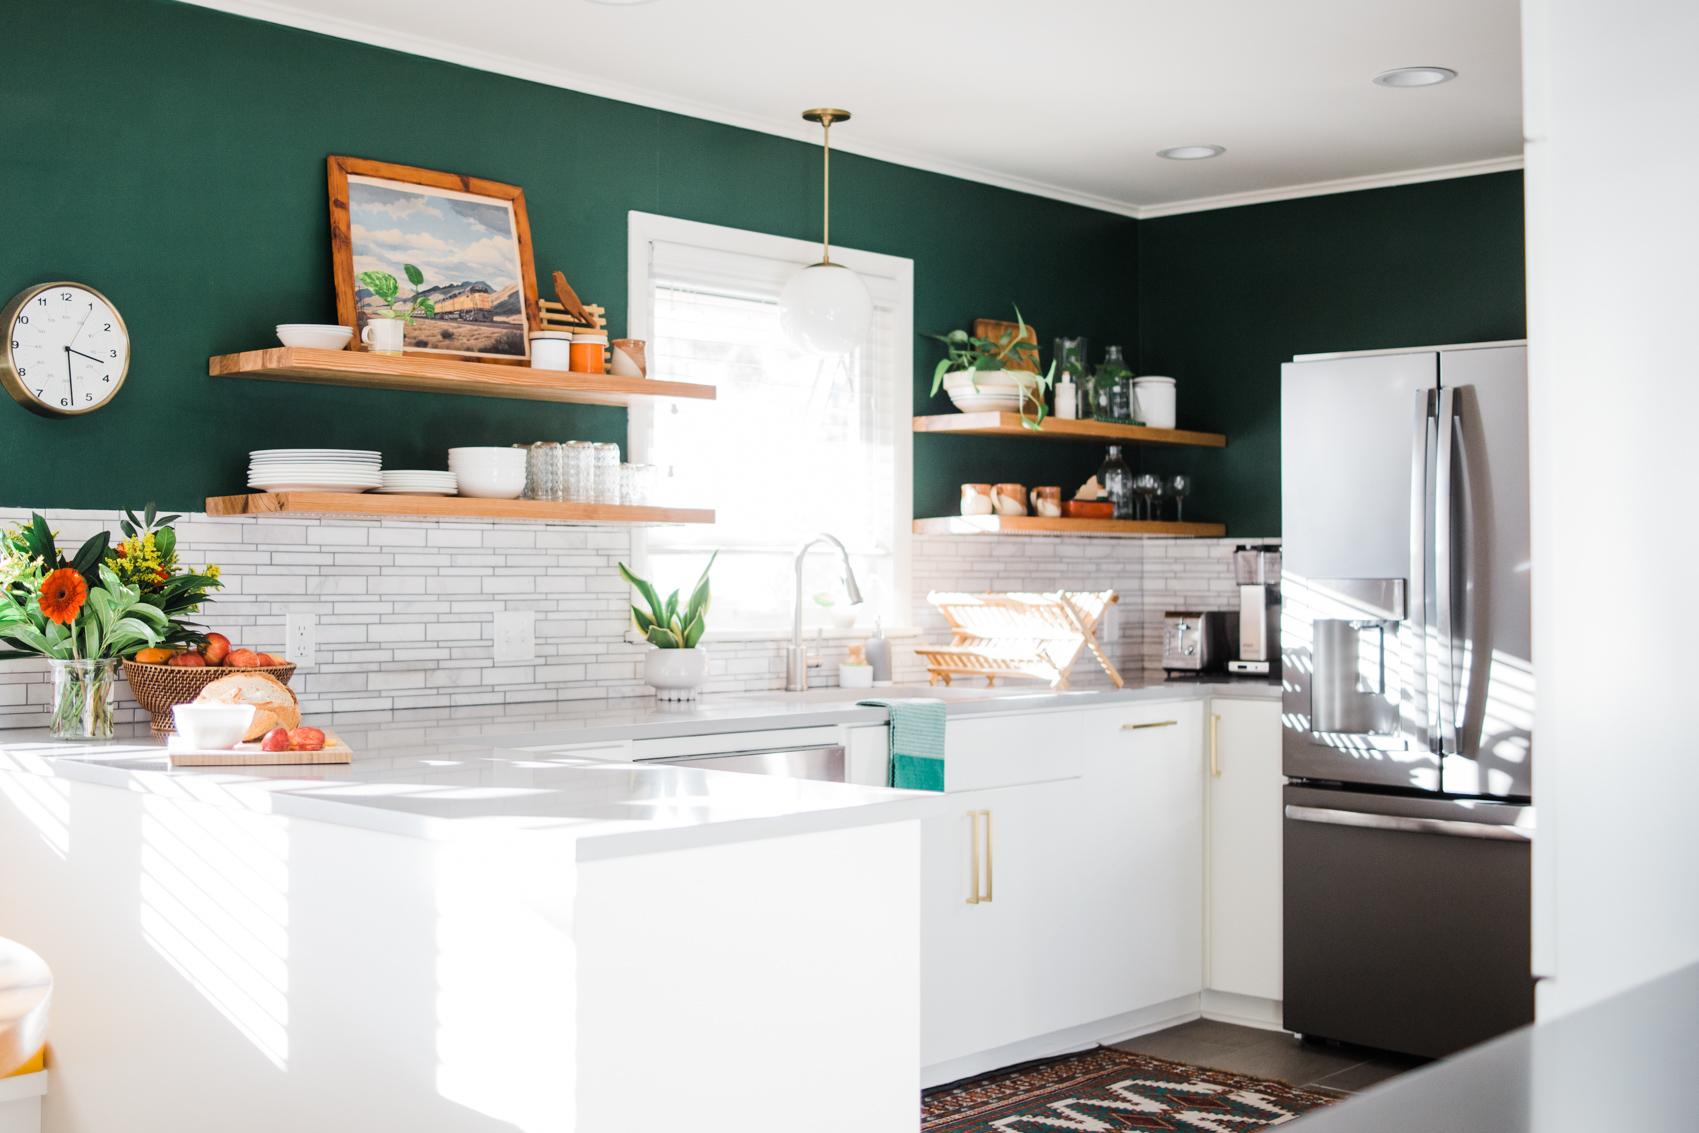 Design Sponge - Before & After: Form Meets Function in a Tulsa Kitchen Makeover